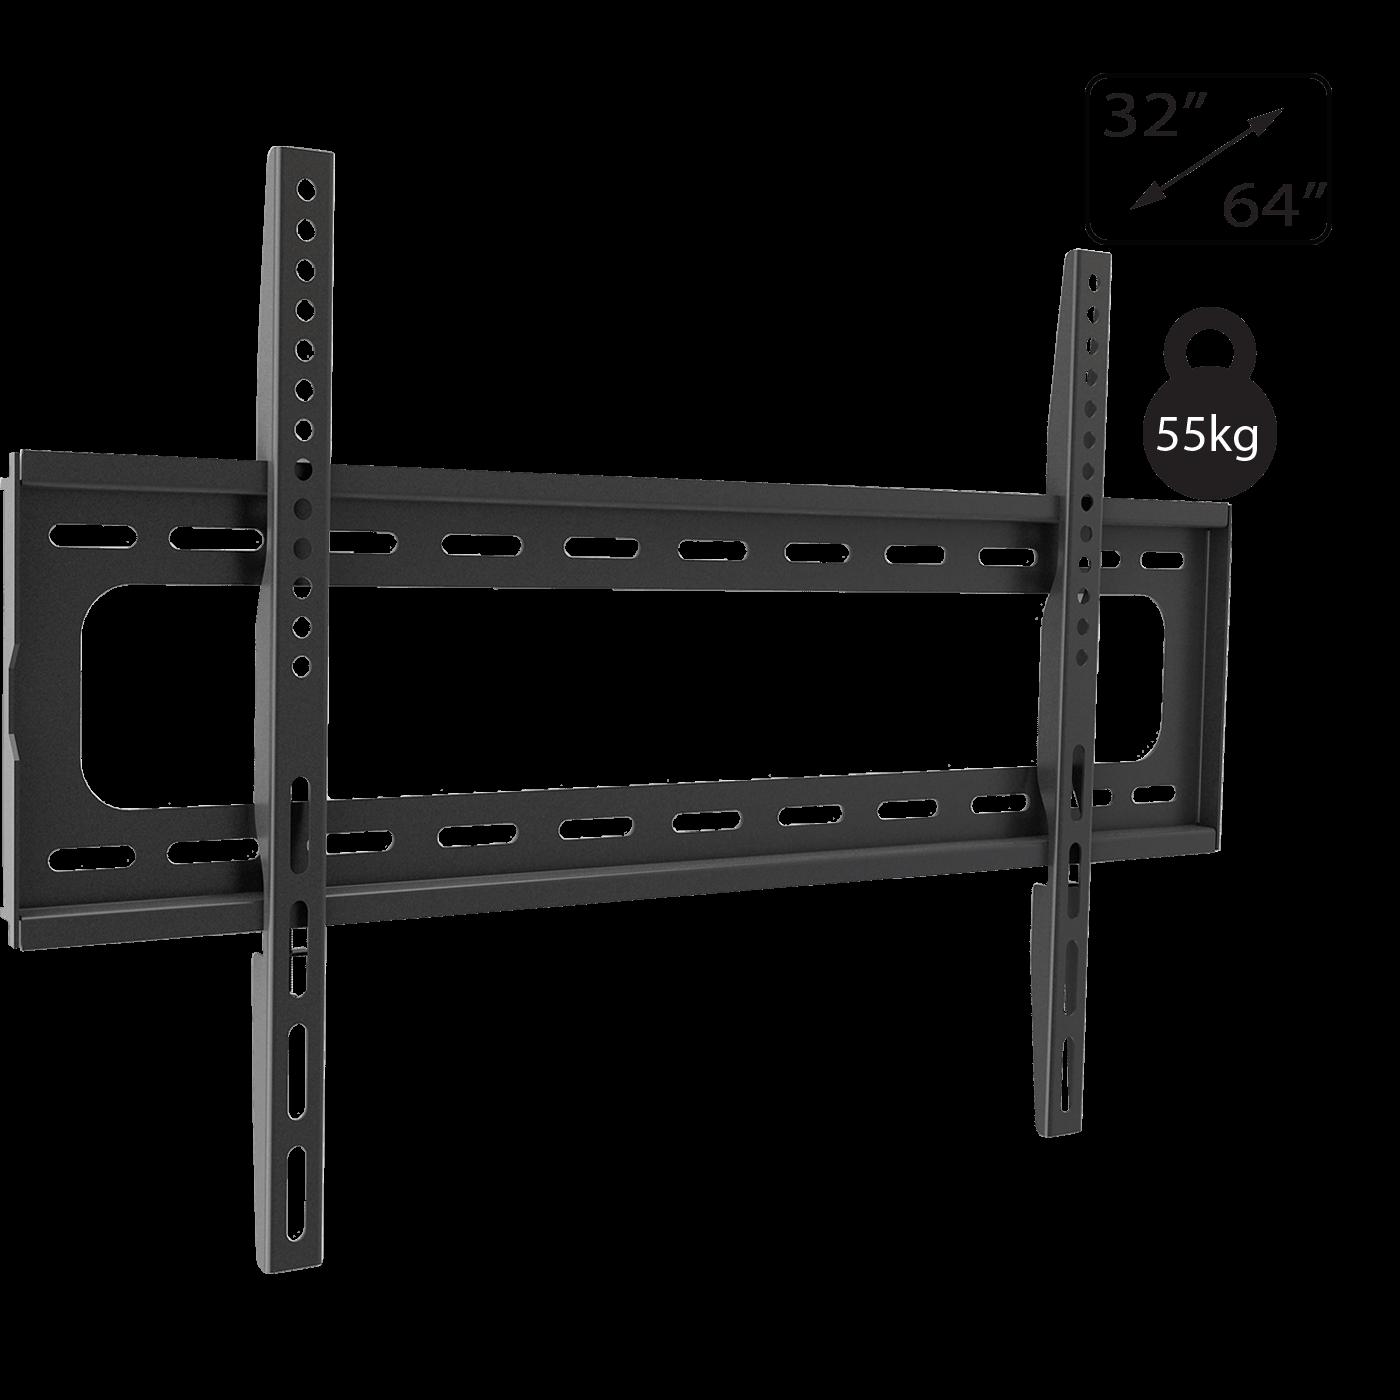 Amiko - Wallmaster 32-64 FIX